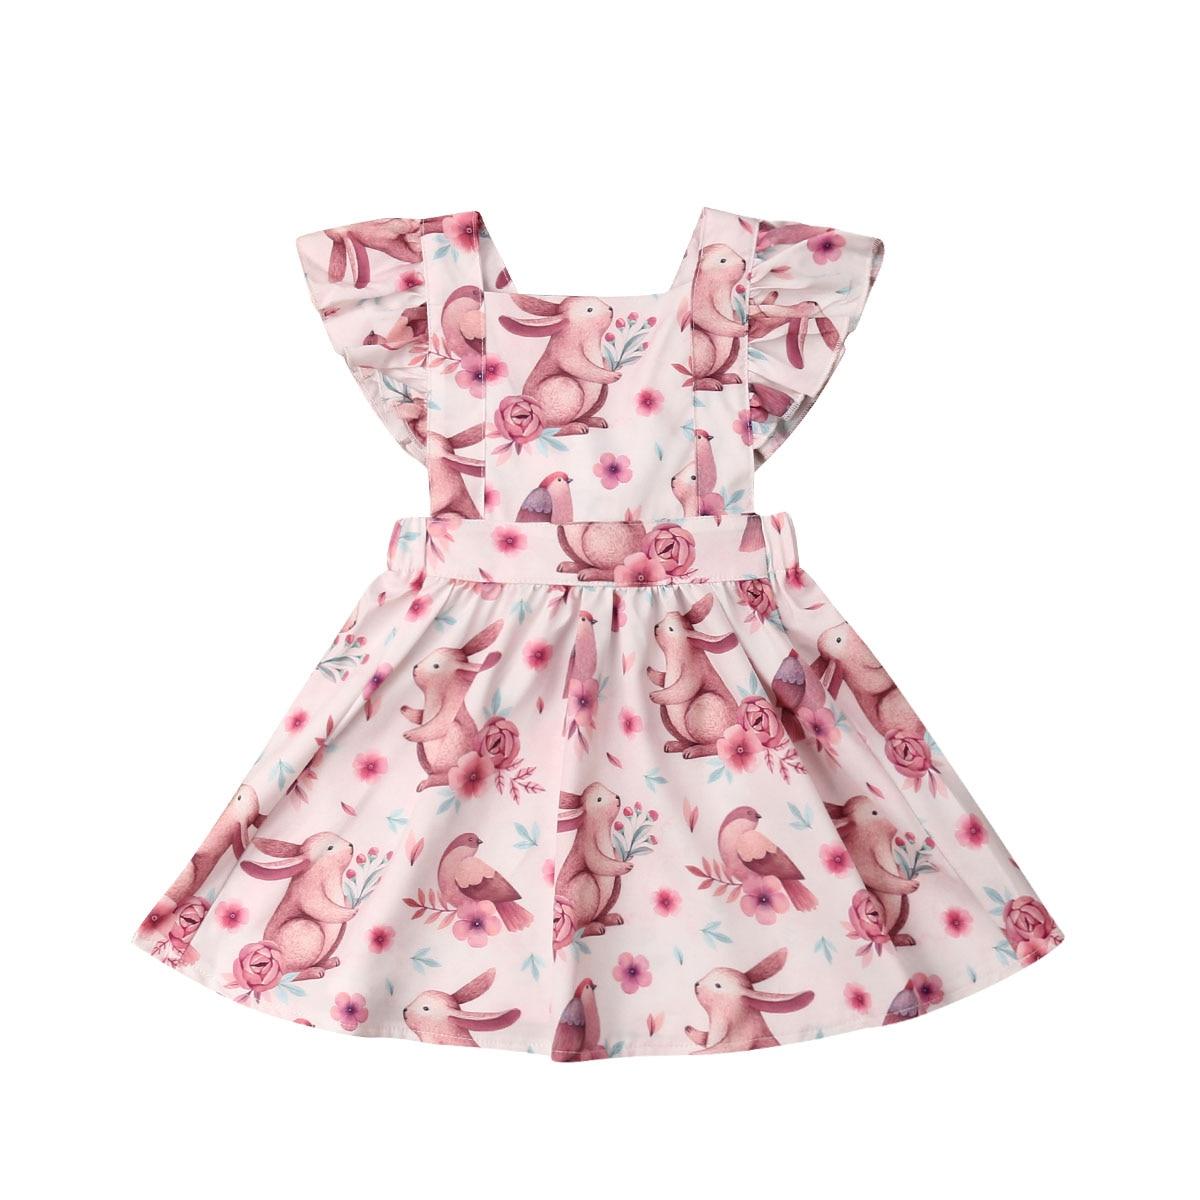 Toddle Baby Girls Kids Infant Floral Cartoon Sundress Clothes Princess Dress